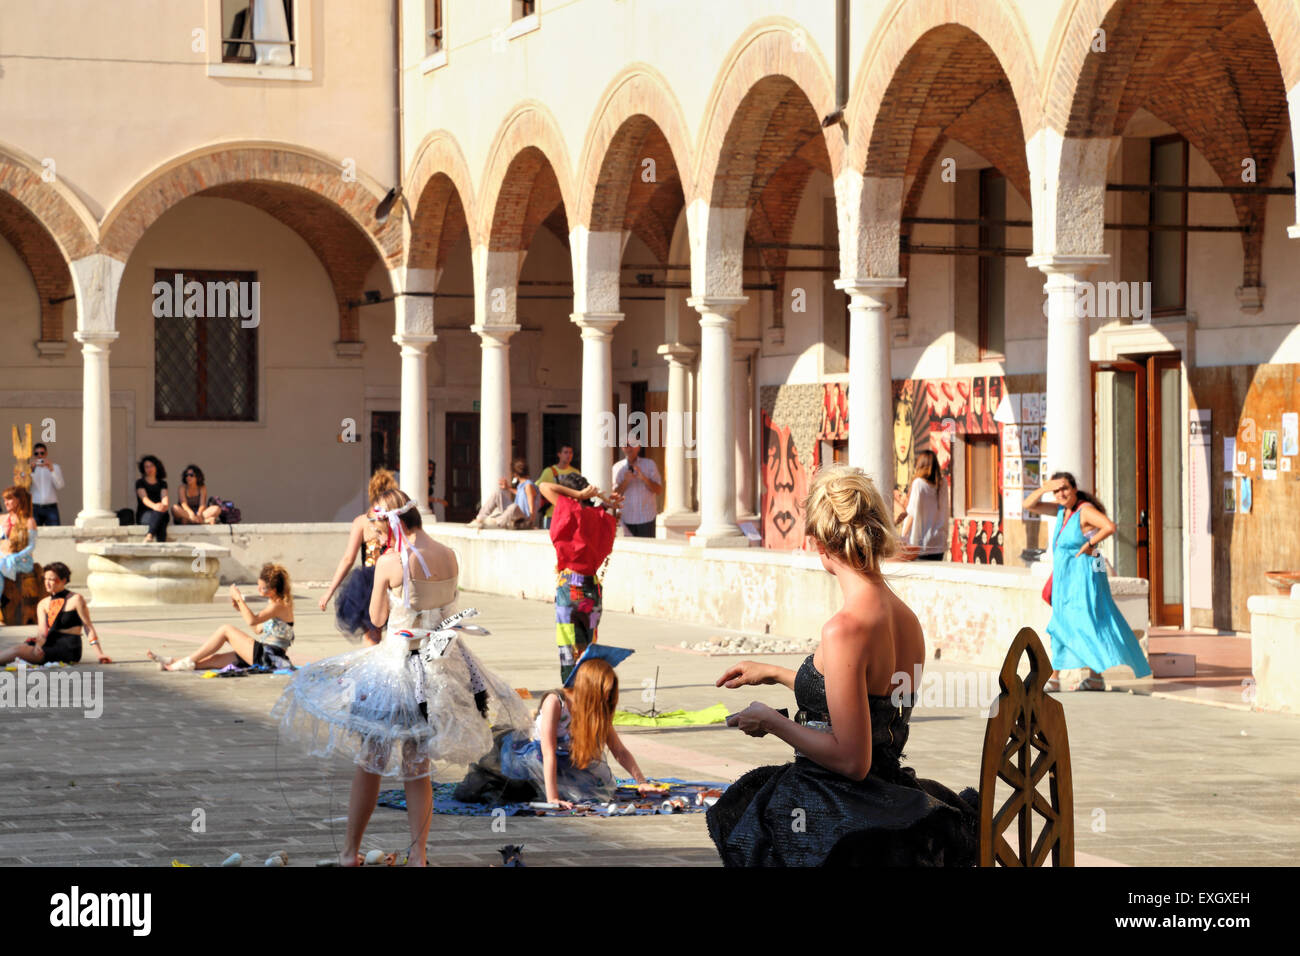 Art night venezia accademia di belle arti di venezia for Accademia delle belle arti corsi